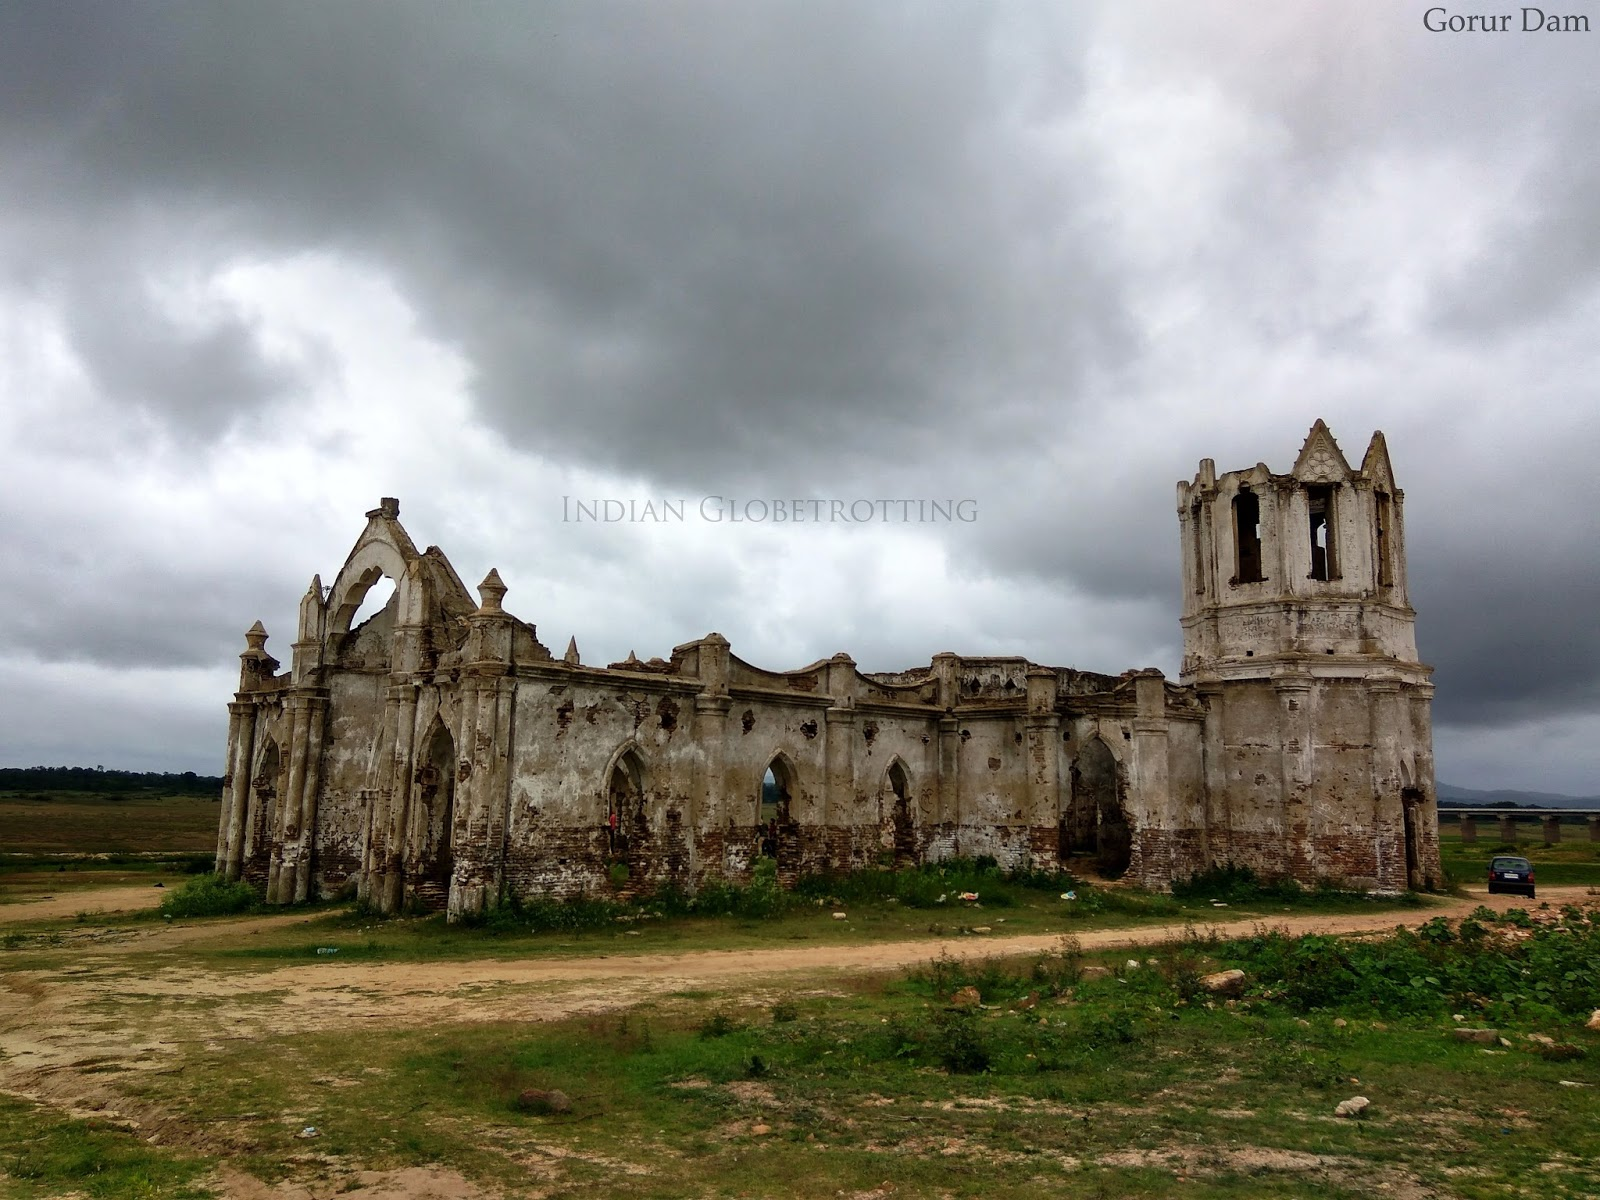 A long view of the Shettihalli church on the banks of the Hemavathi reservoir, Karnataka